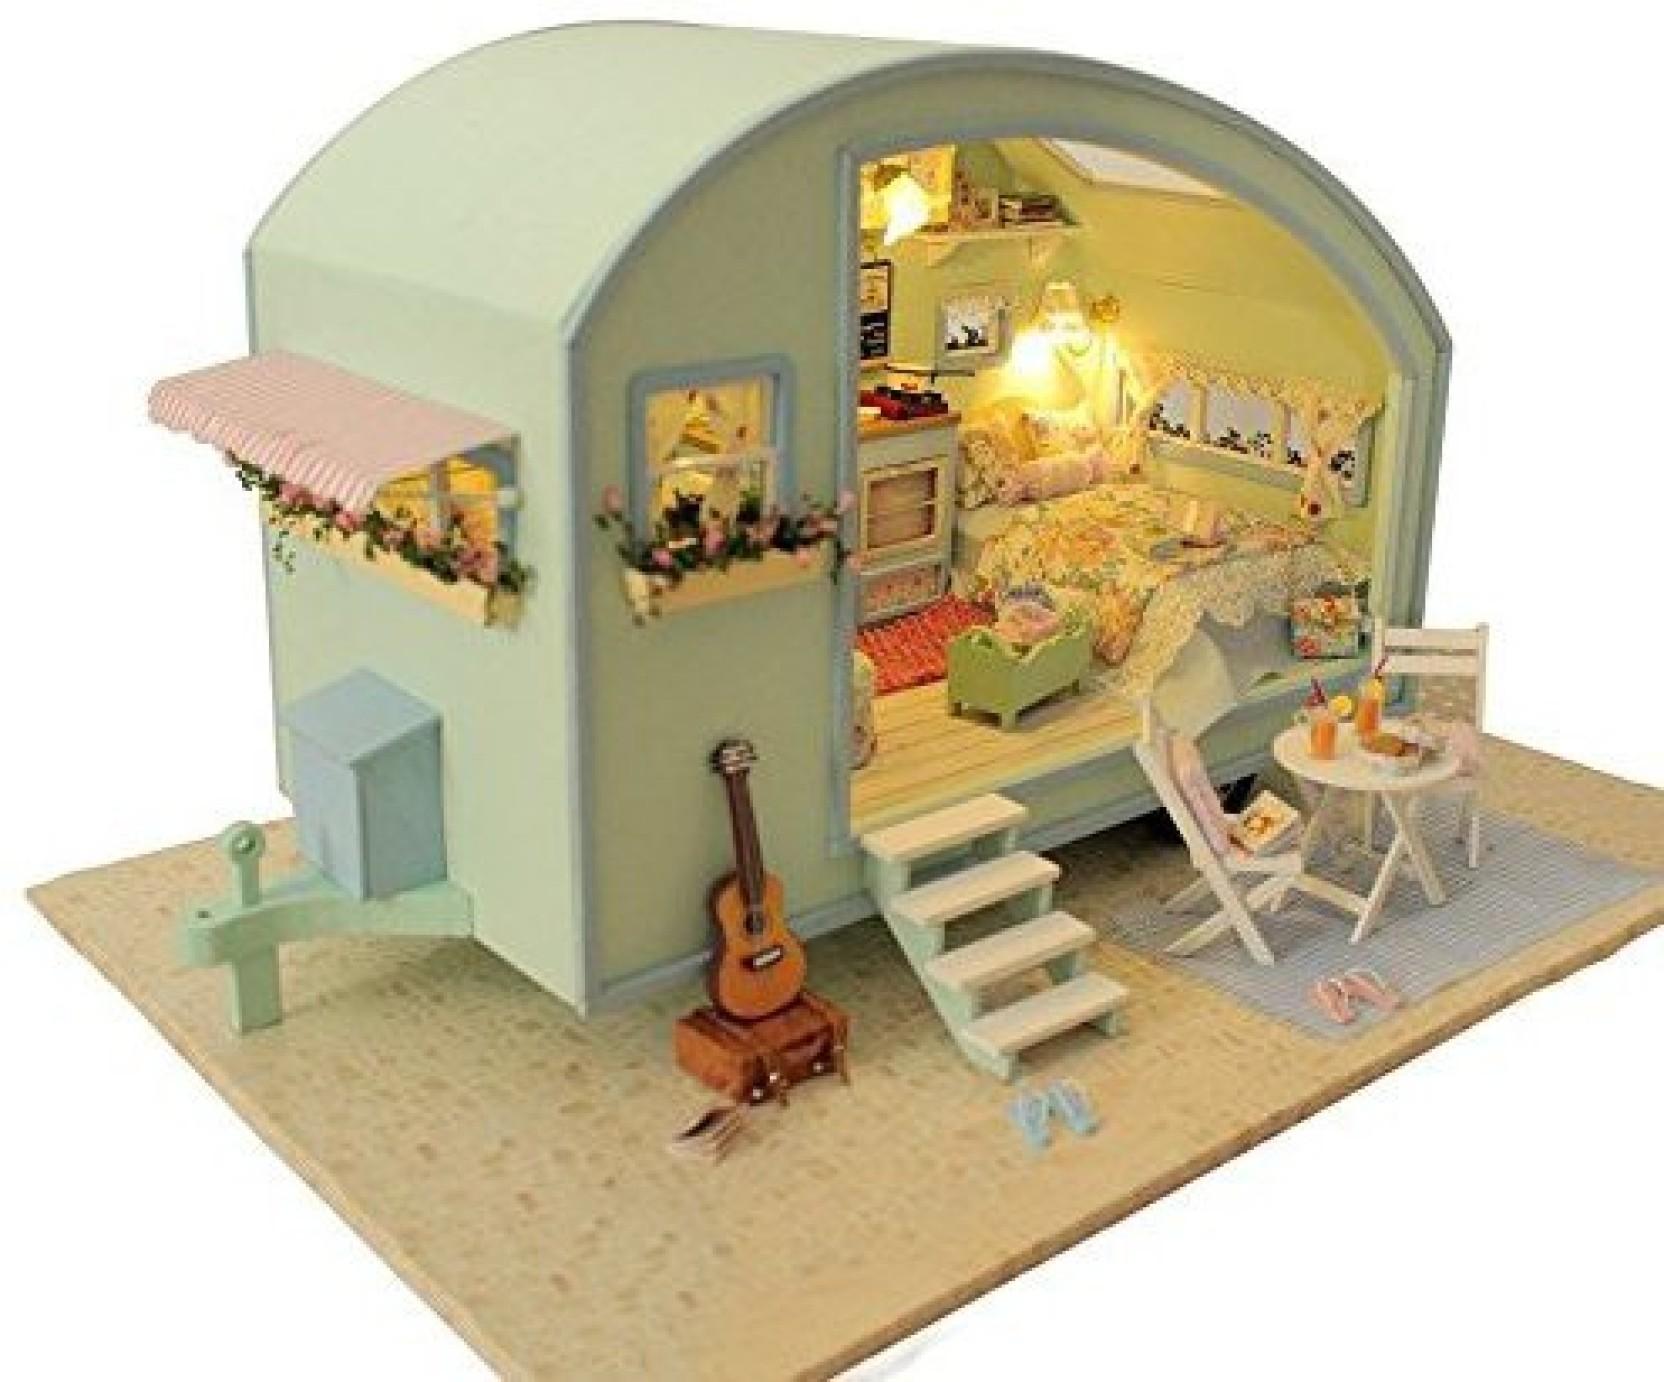 Dollhouse Miniature Handmade Set of 4 Christmas Pillows